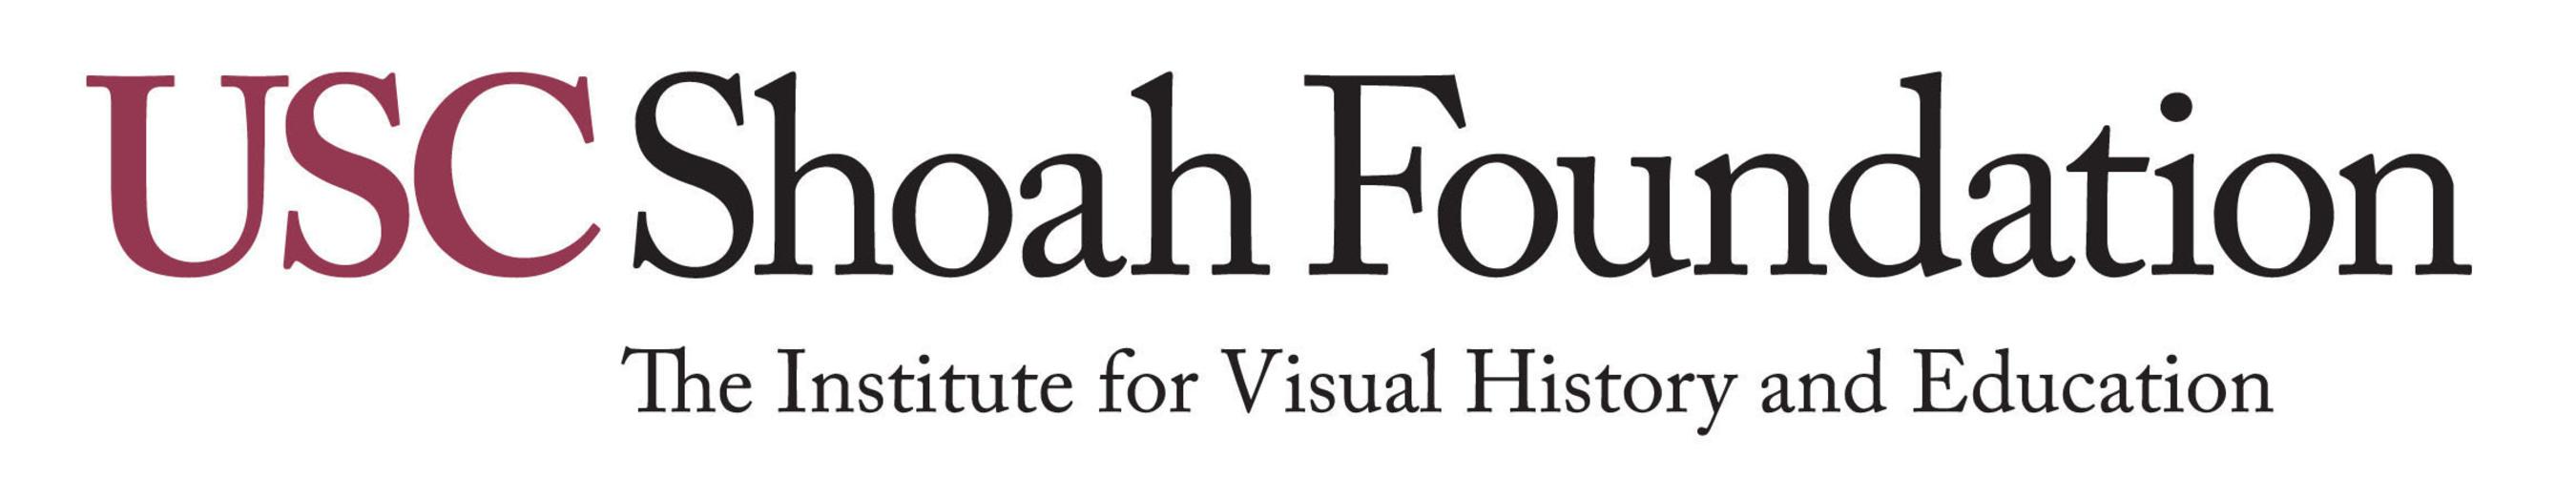 USC Shoah Foundation logo.